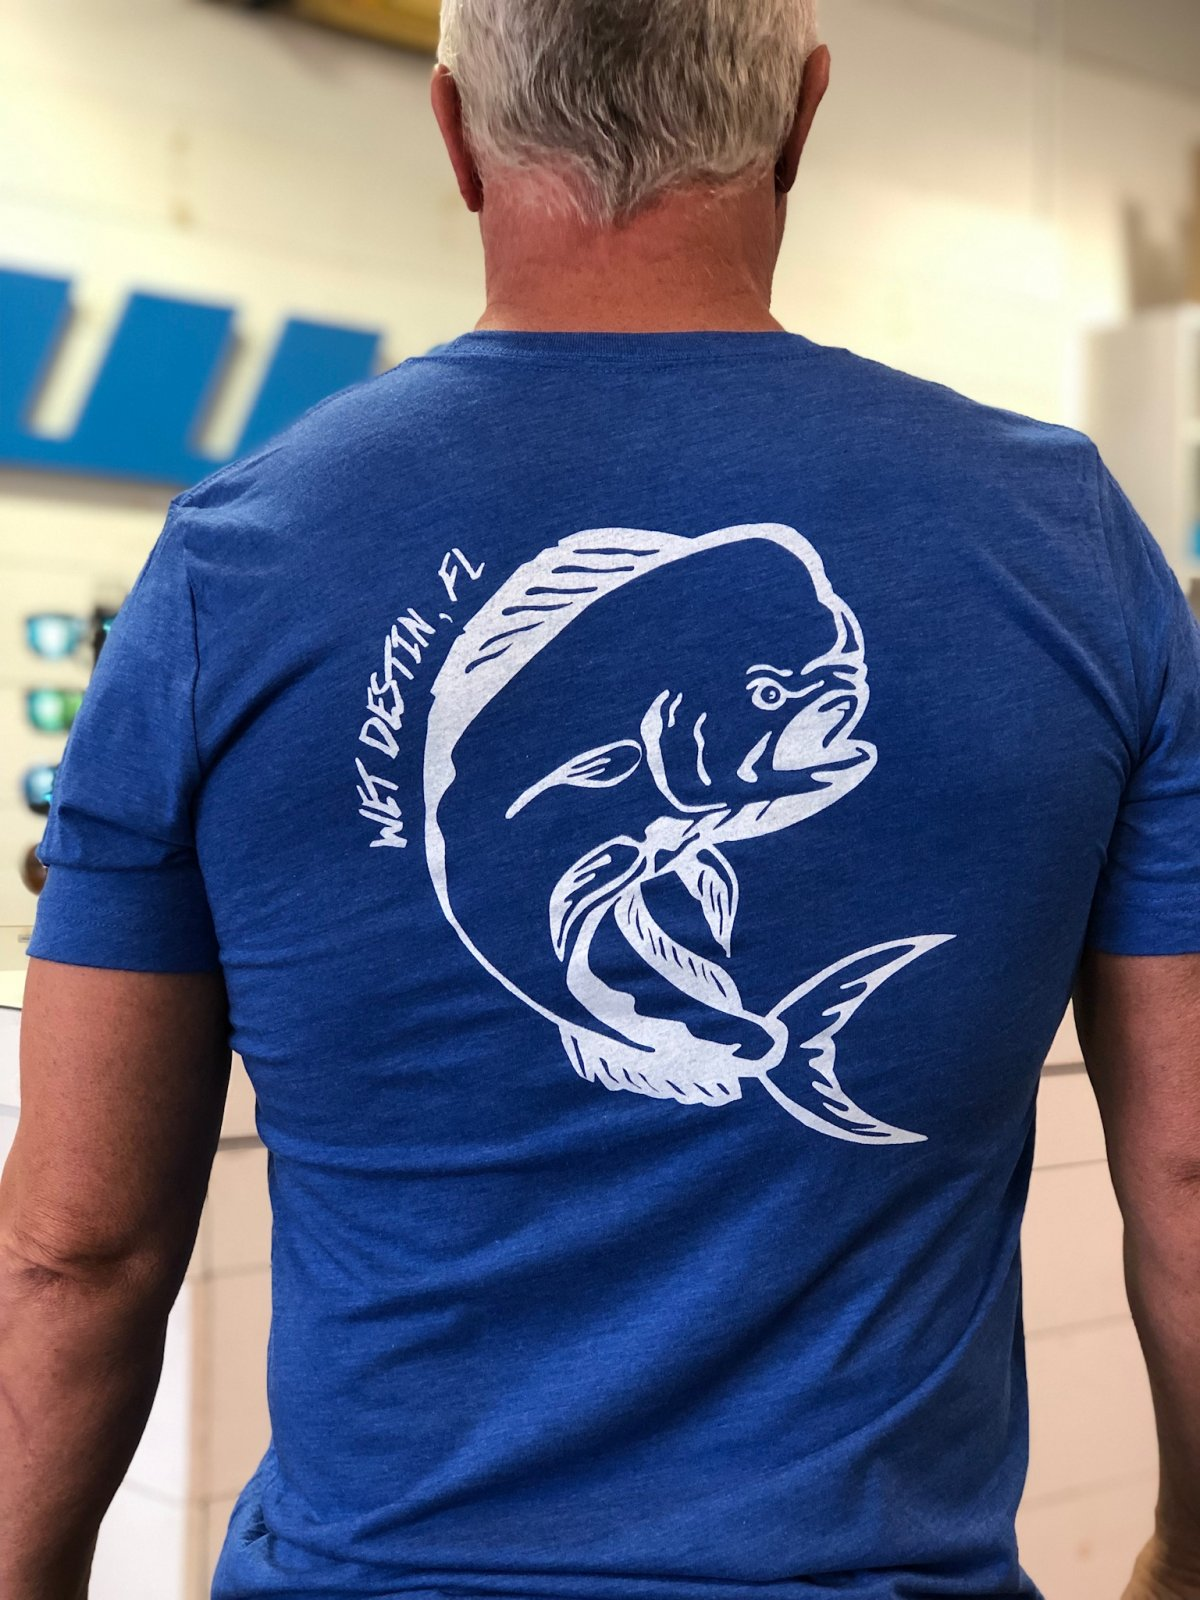 WET - Wet Destin FL Dolphin Tee